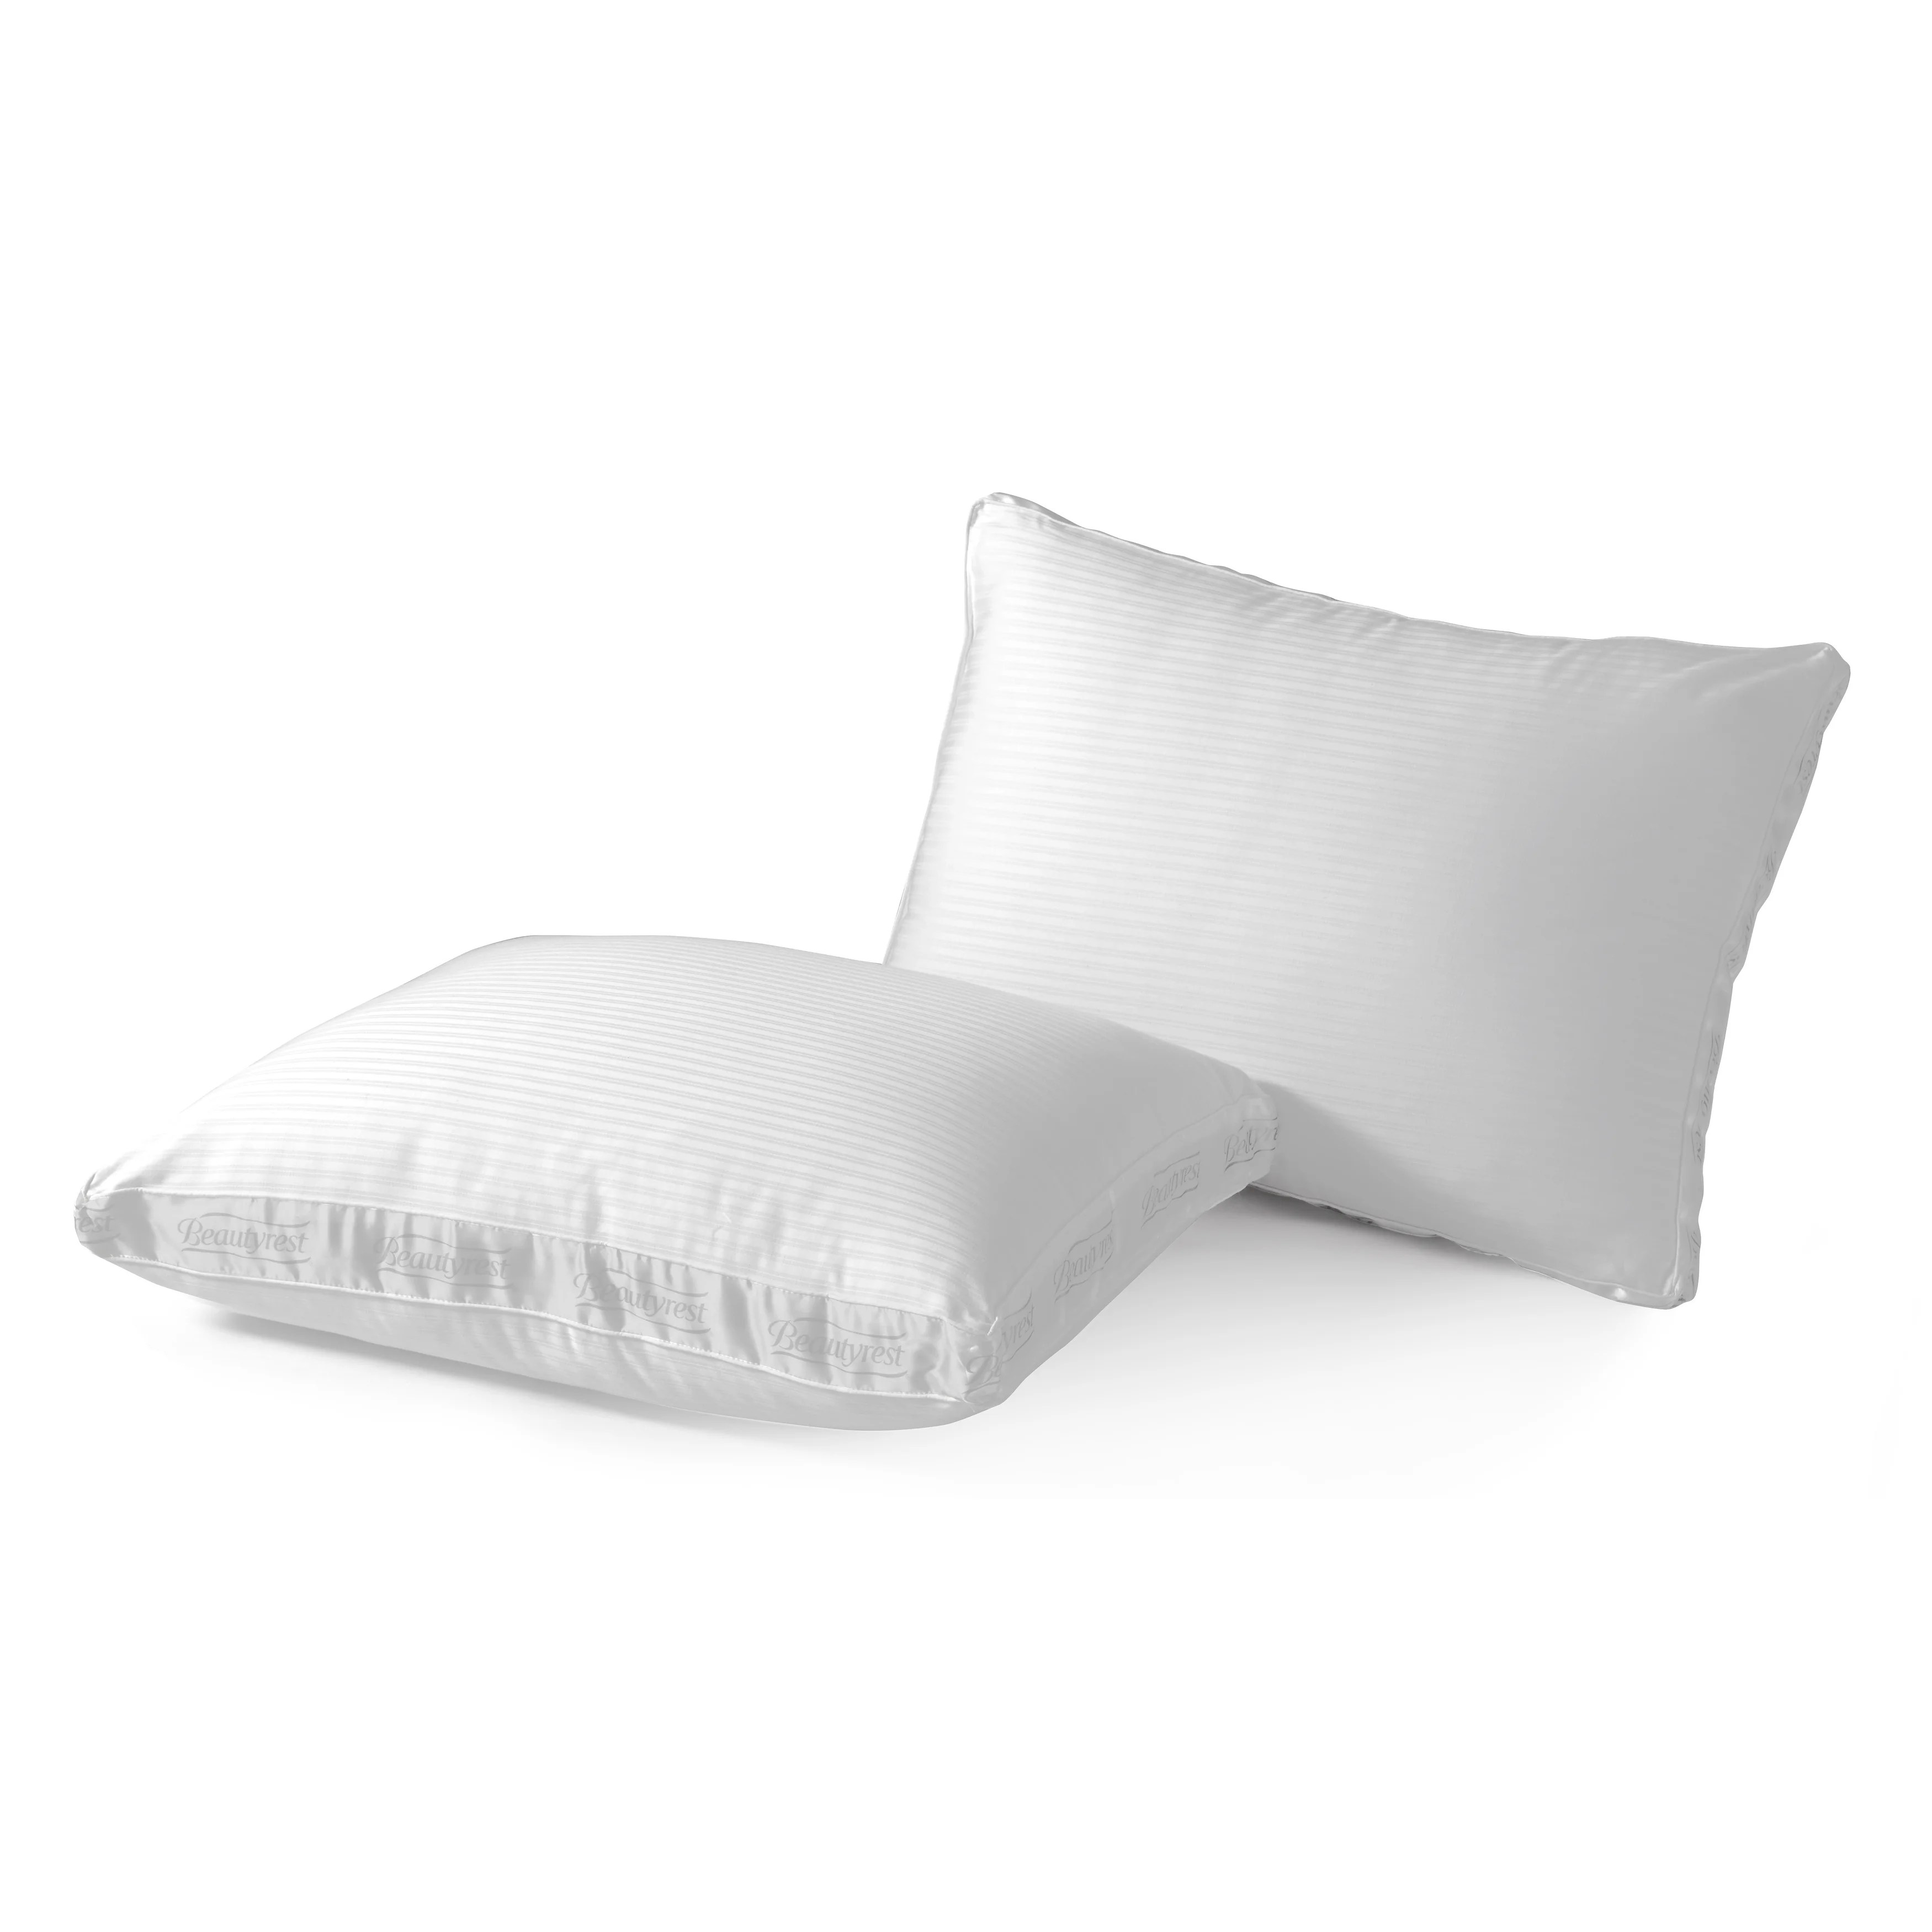 beautyrest extra firm support pillow standard set of 2 white